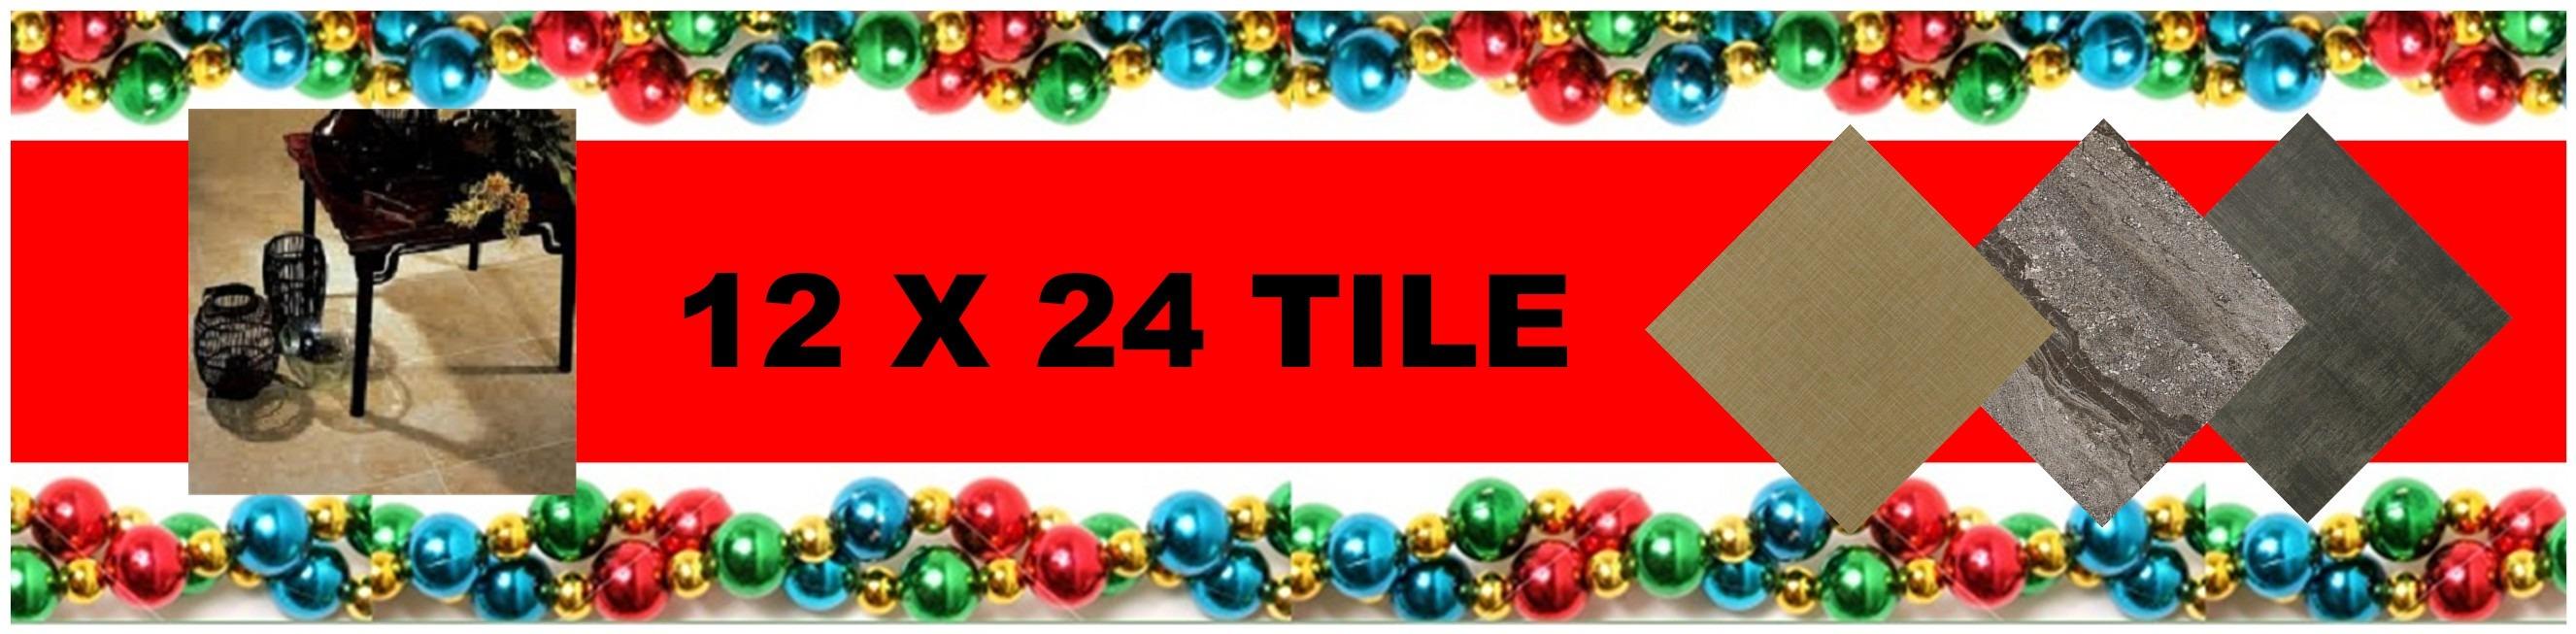 CHRISTMAS 12 X 24 TILE HEADER